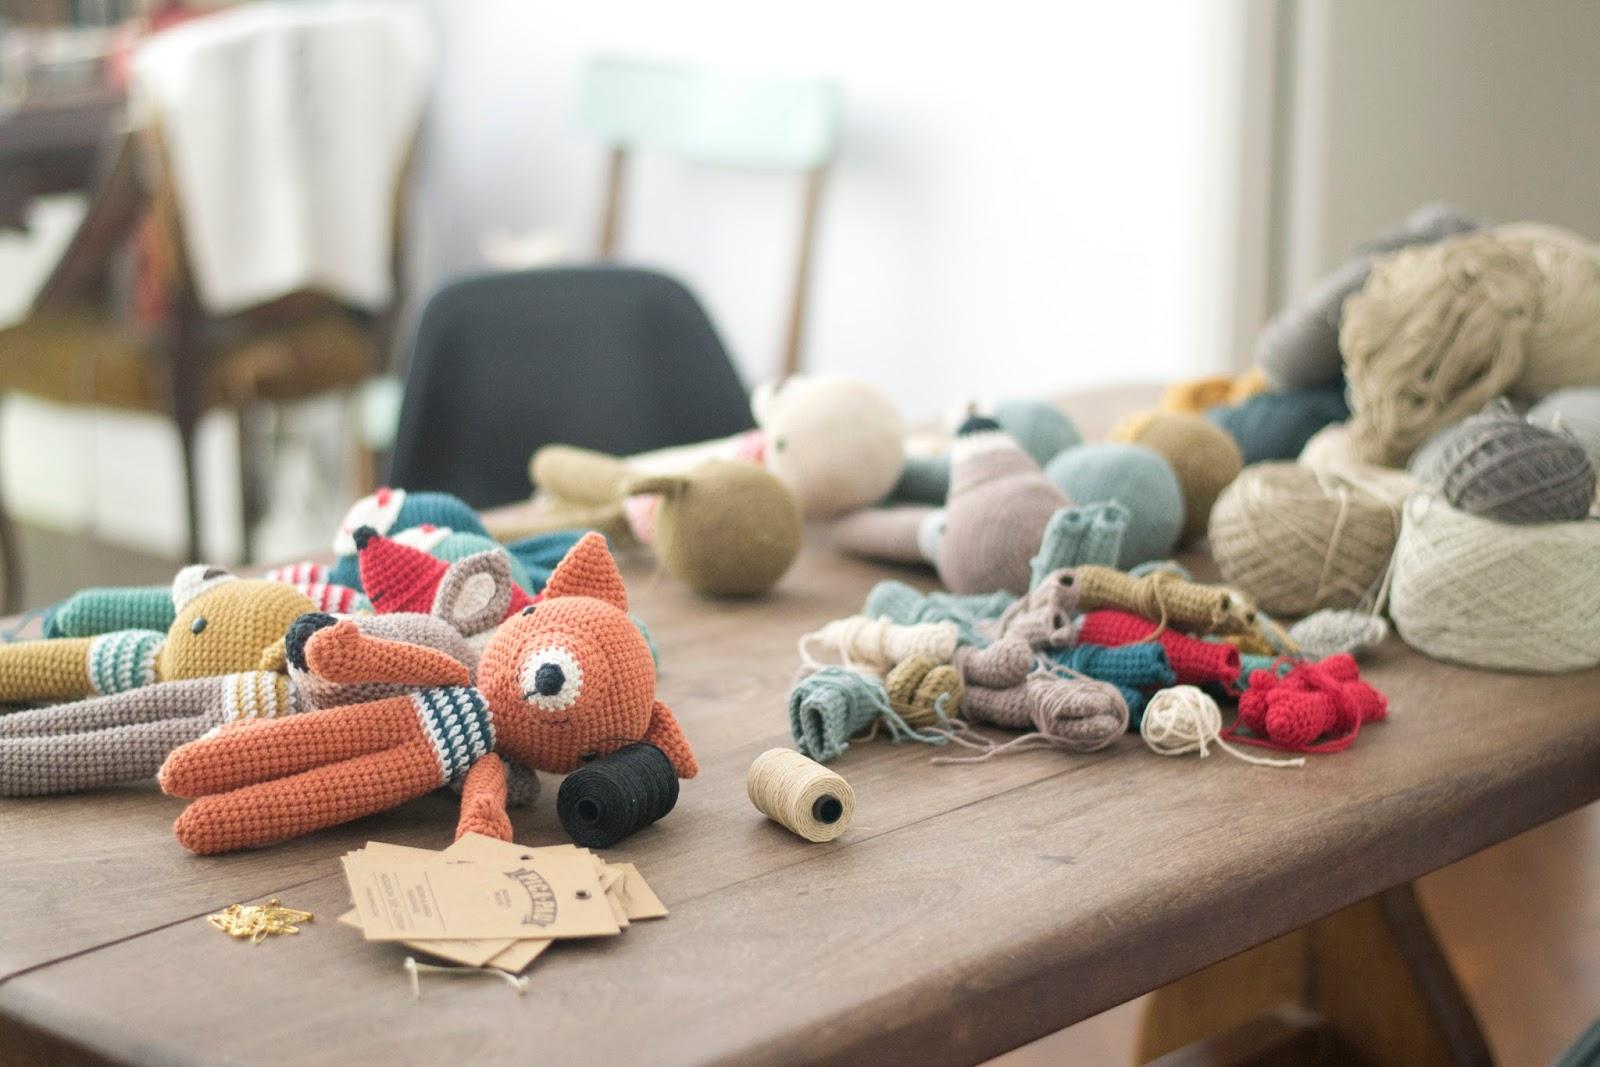 Amigurumi Mono Crochet Kit Patrón de Ganchillo Animal Patrón | Etsy | 1067x1600